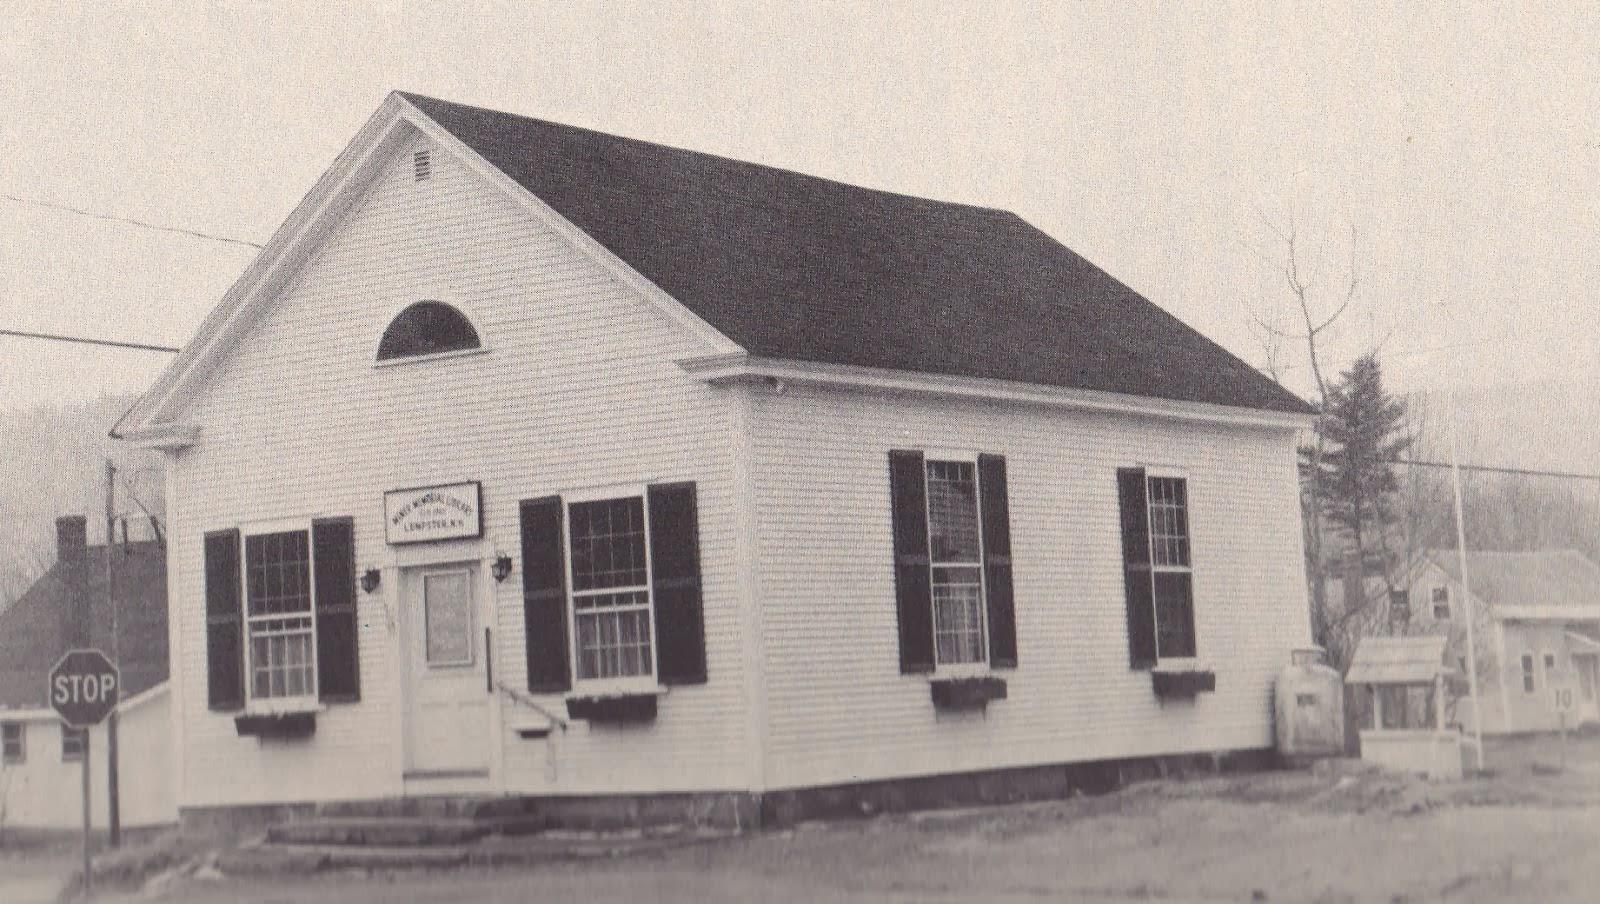 Miner Memorial Library